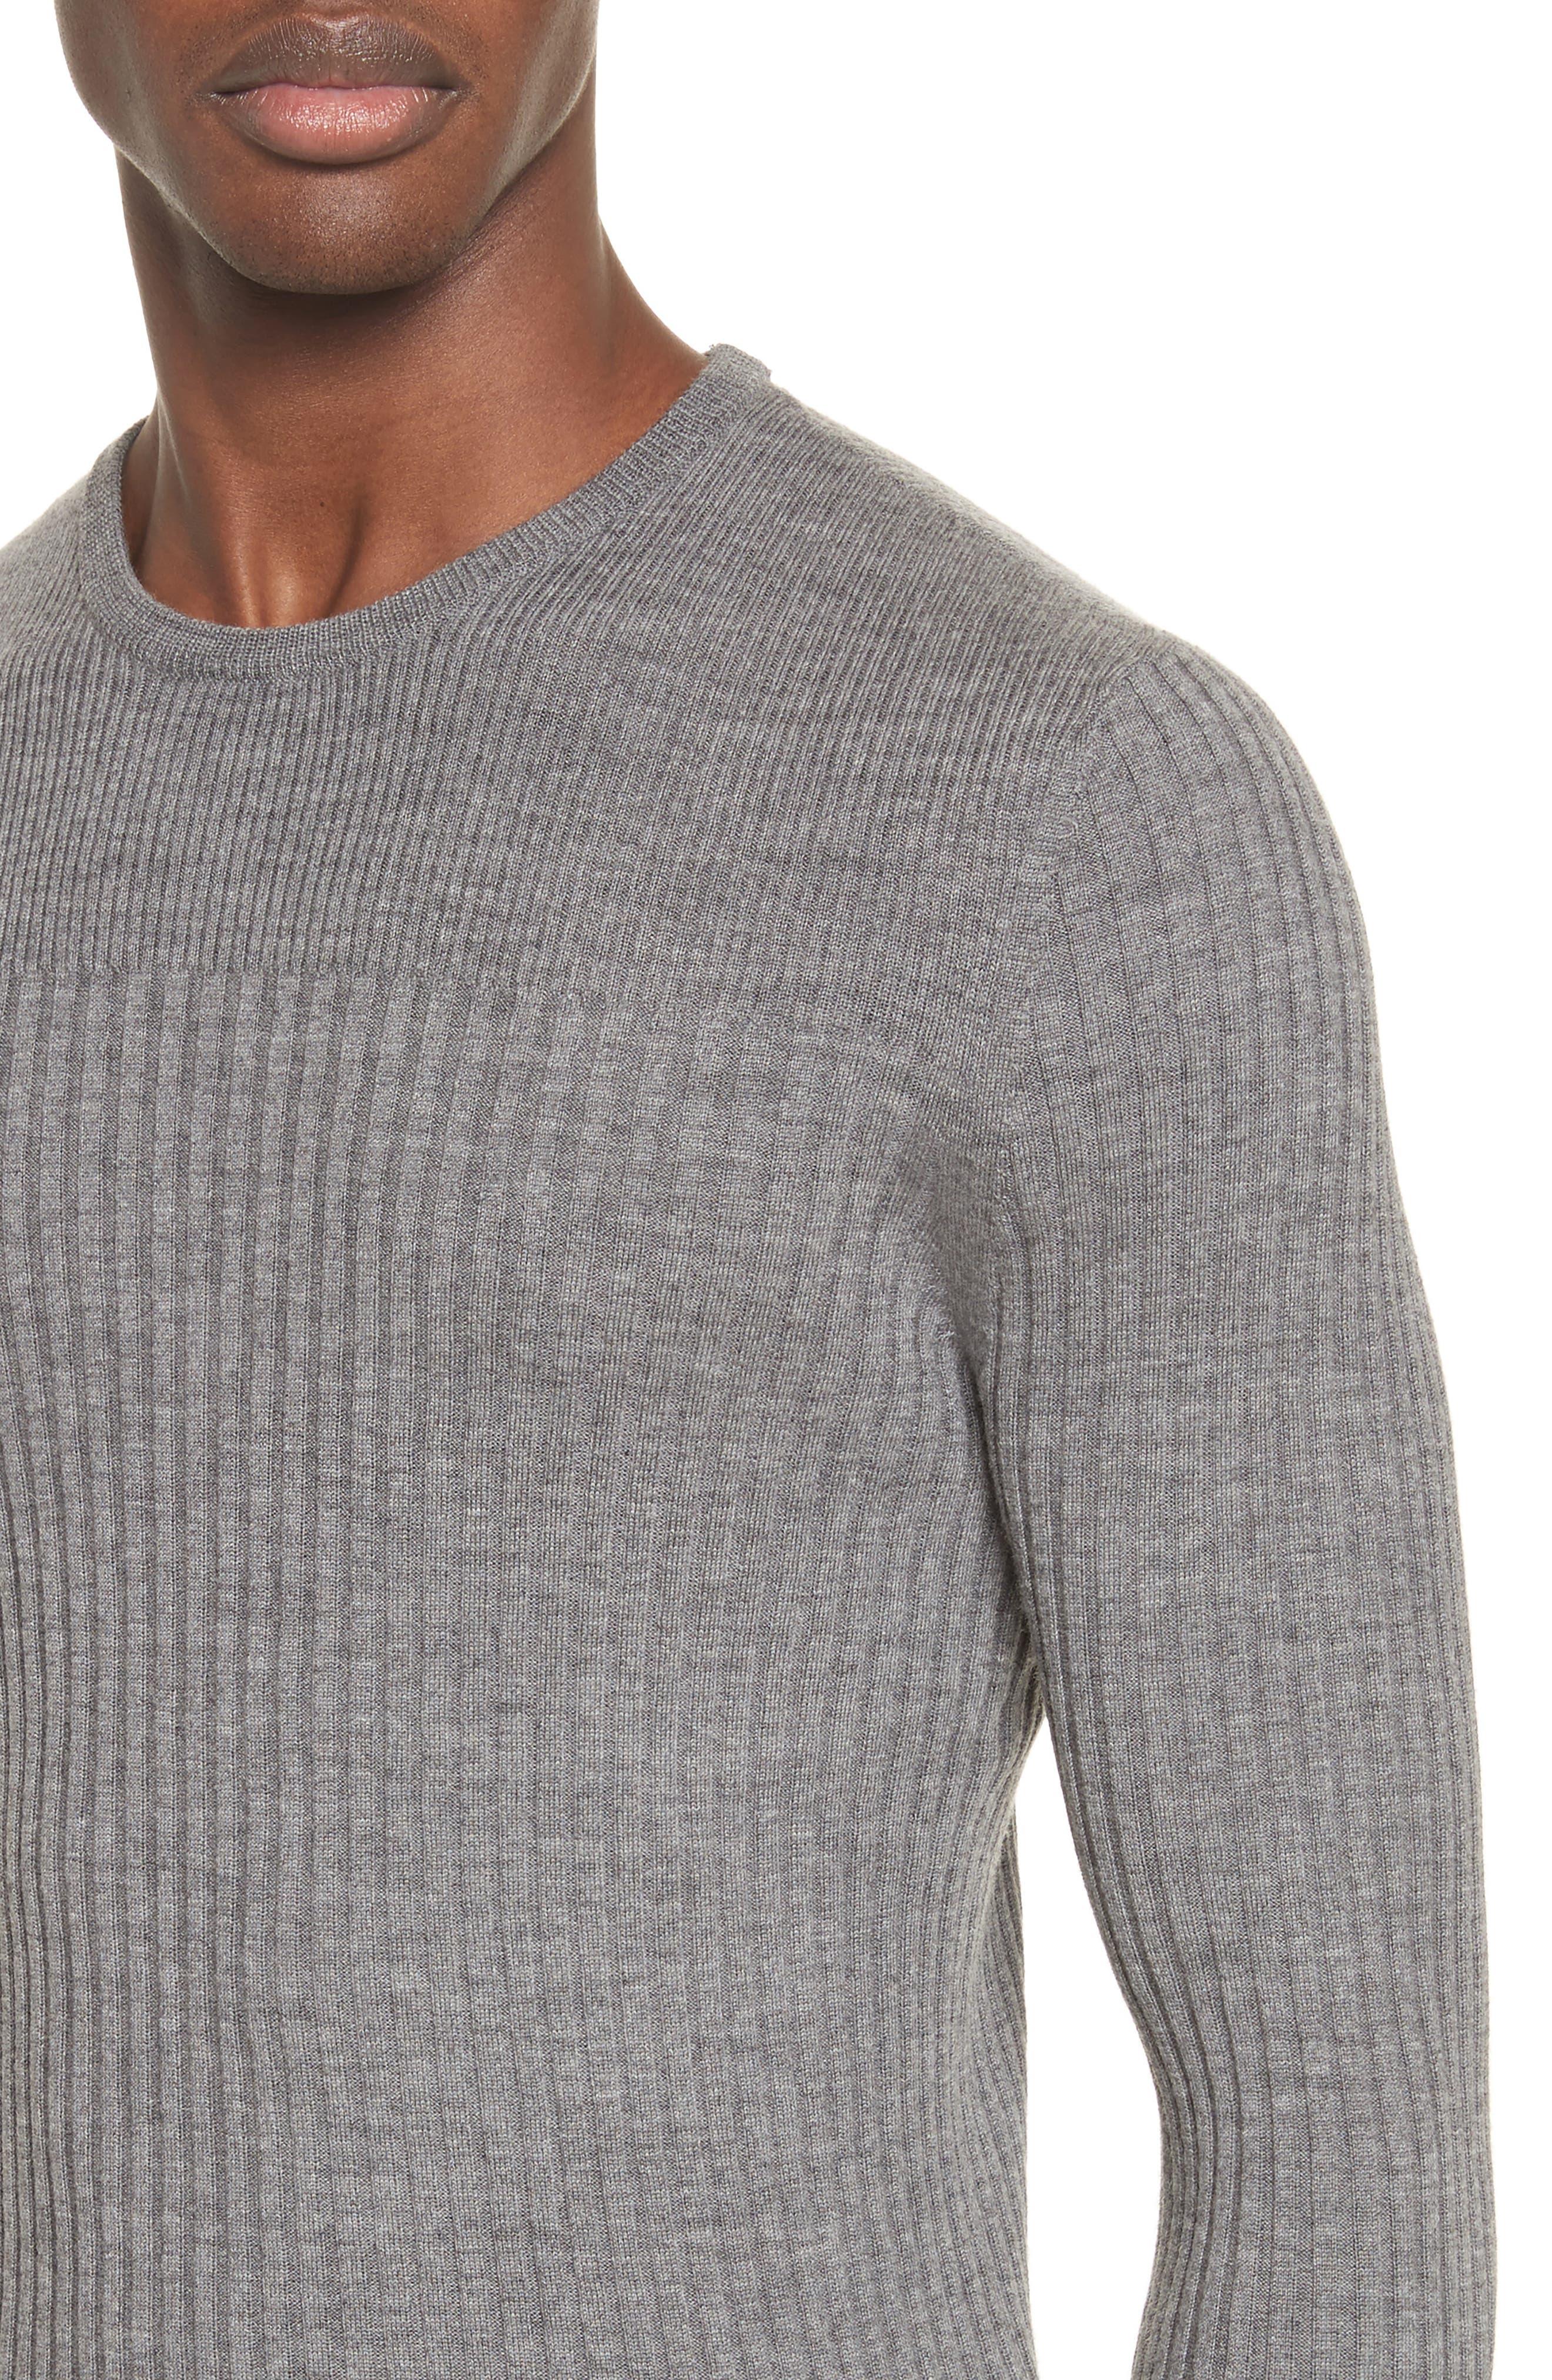 Merino Wool Sweater,                             Alternate thumbnail 4, color,                             030